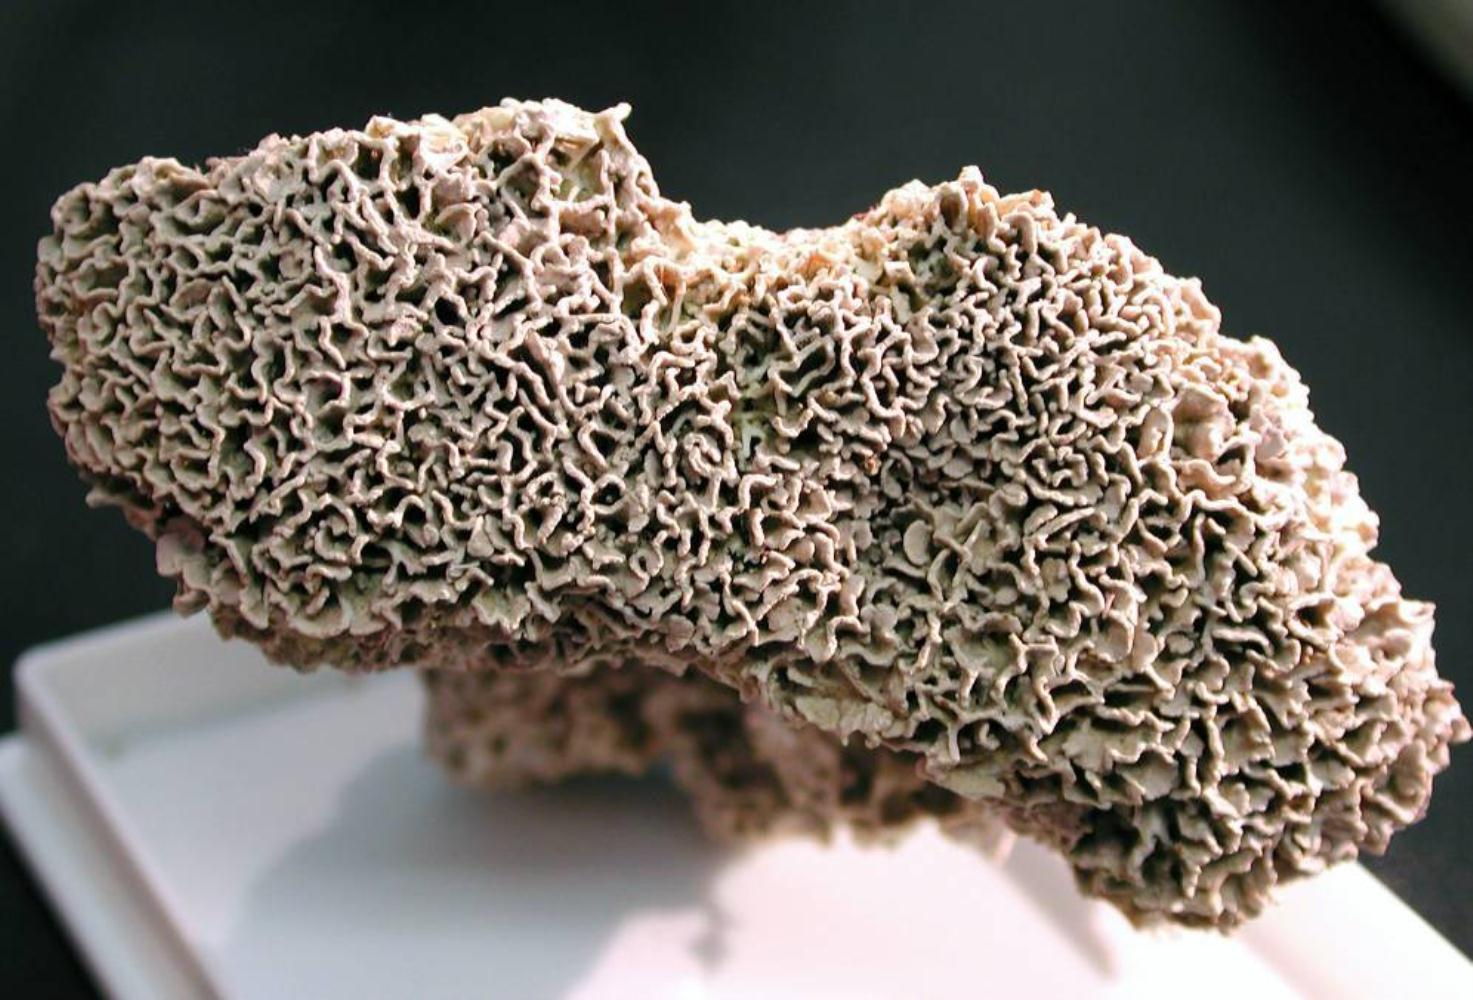 Trottoir coralline